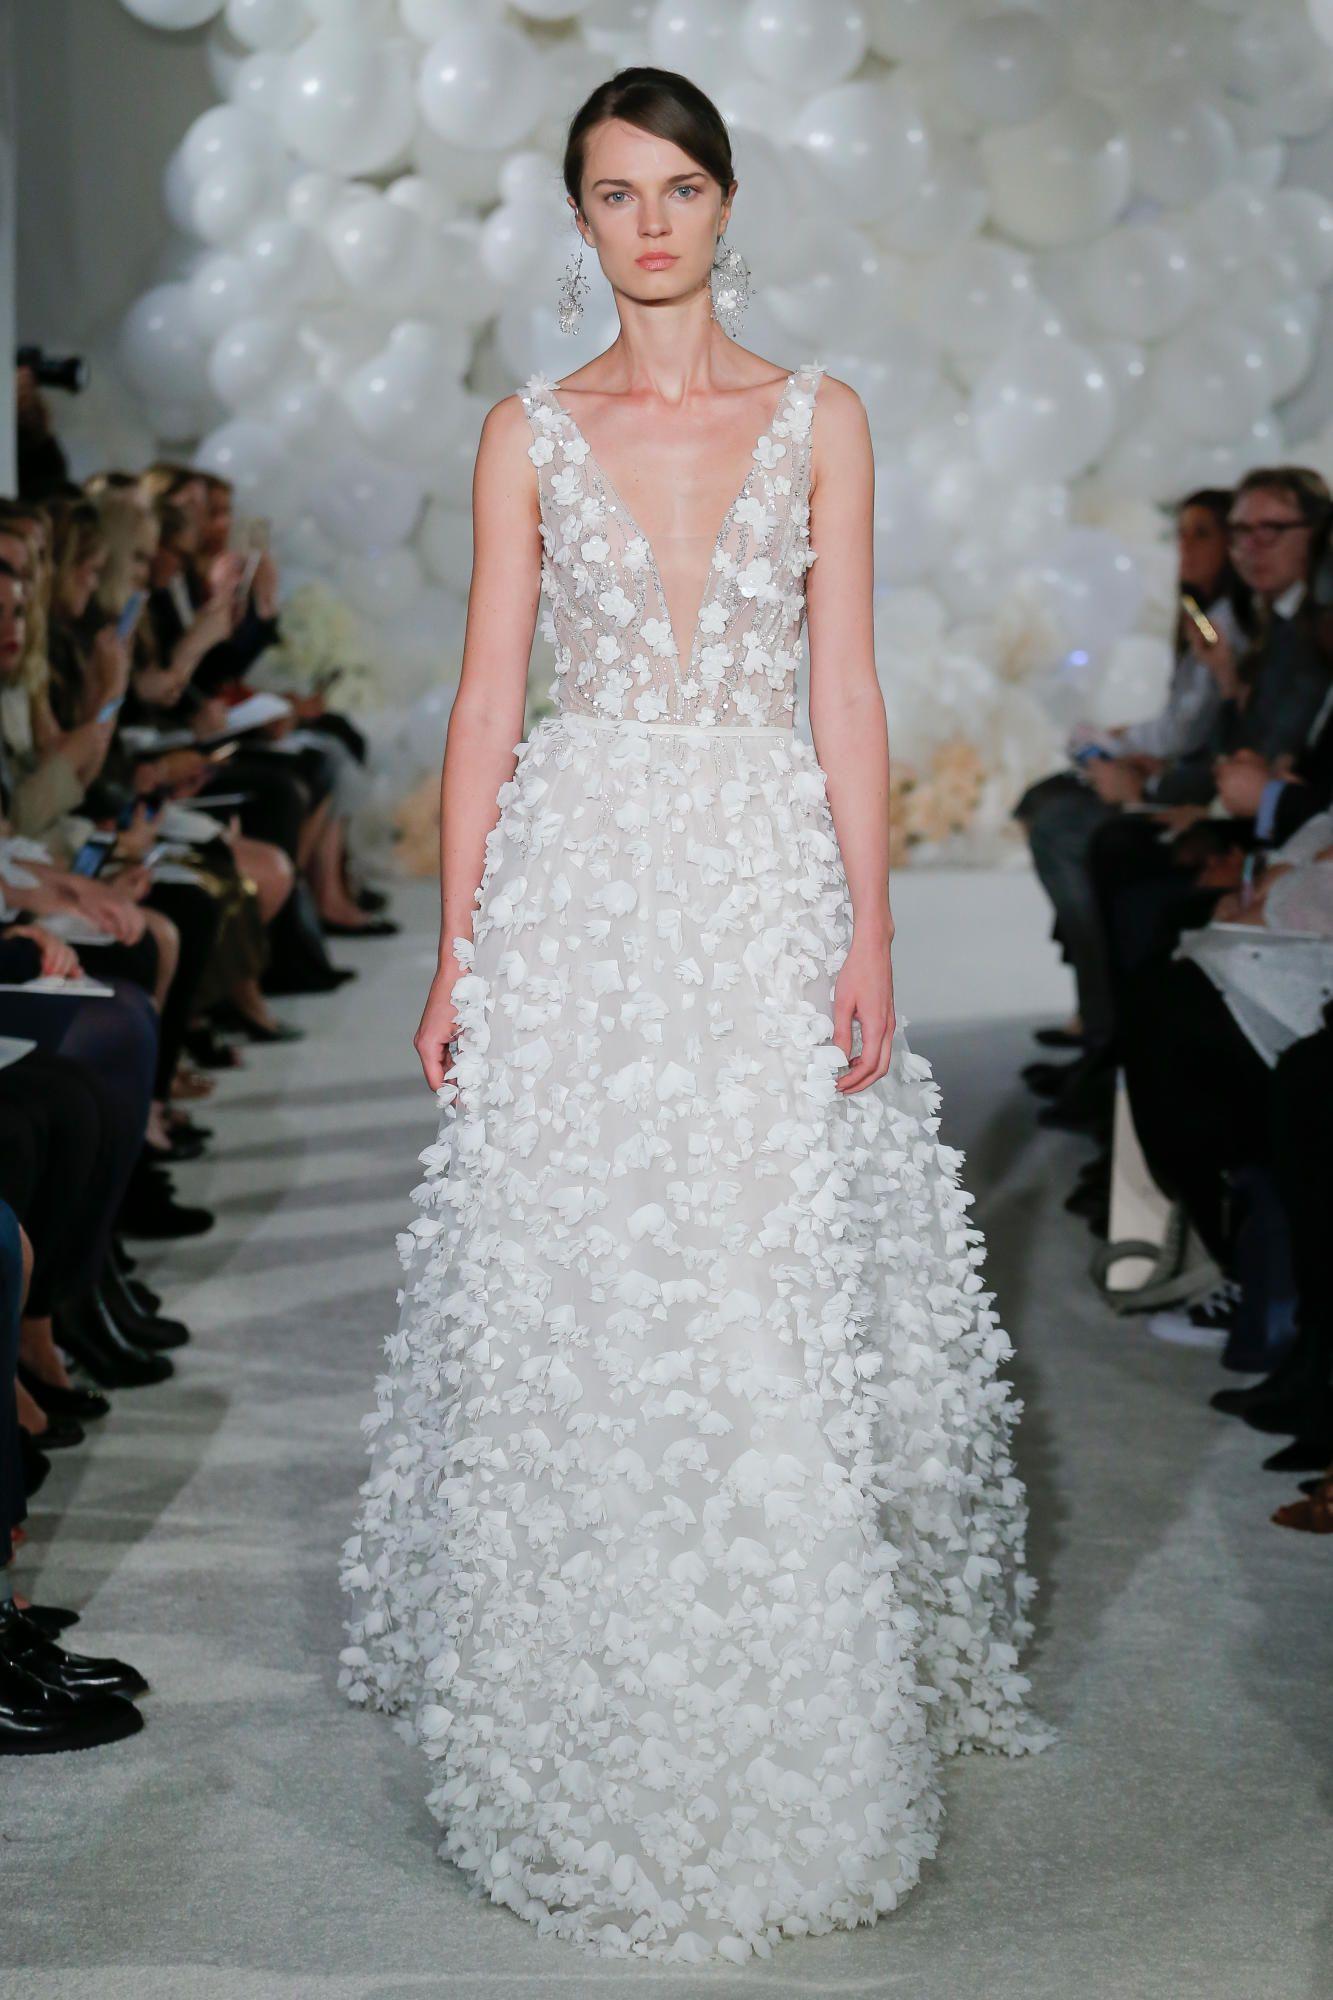 mira-zwillinger-spring-2018-bridal-pearl-dress Tendências de vestidos de noiva para 2018